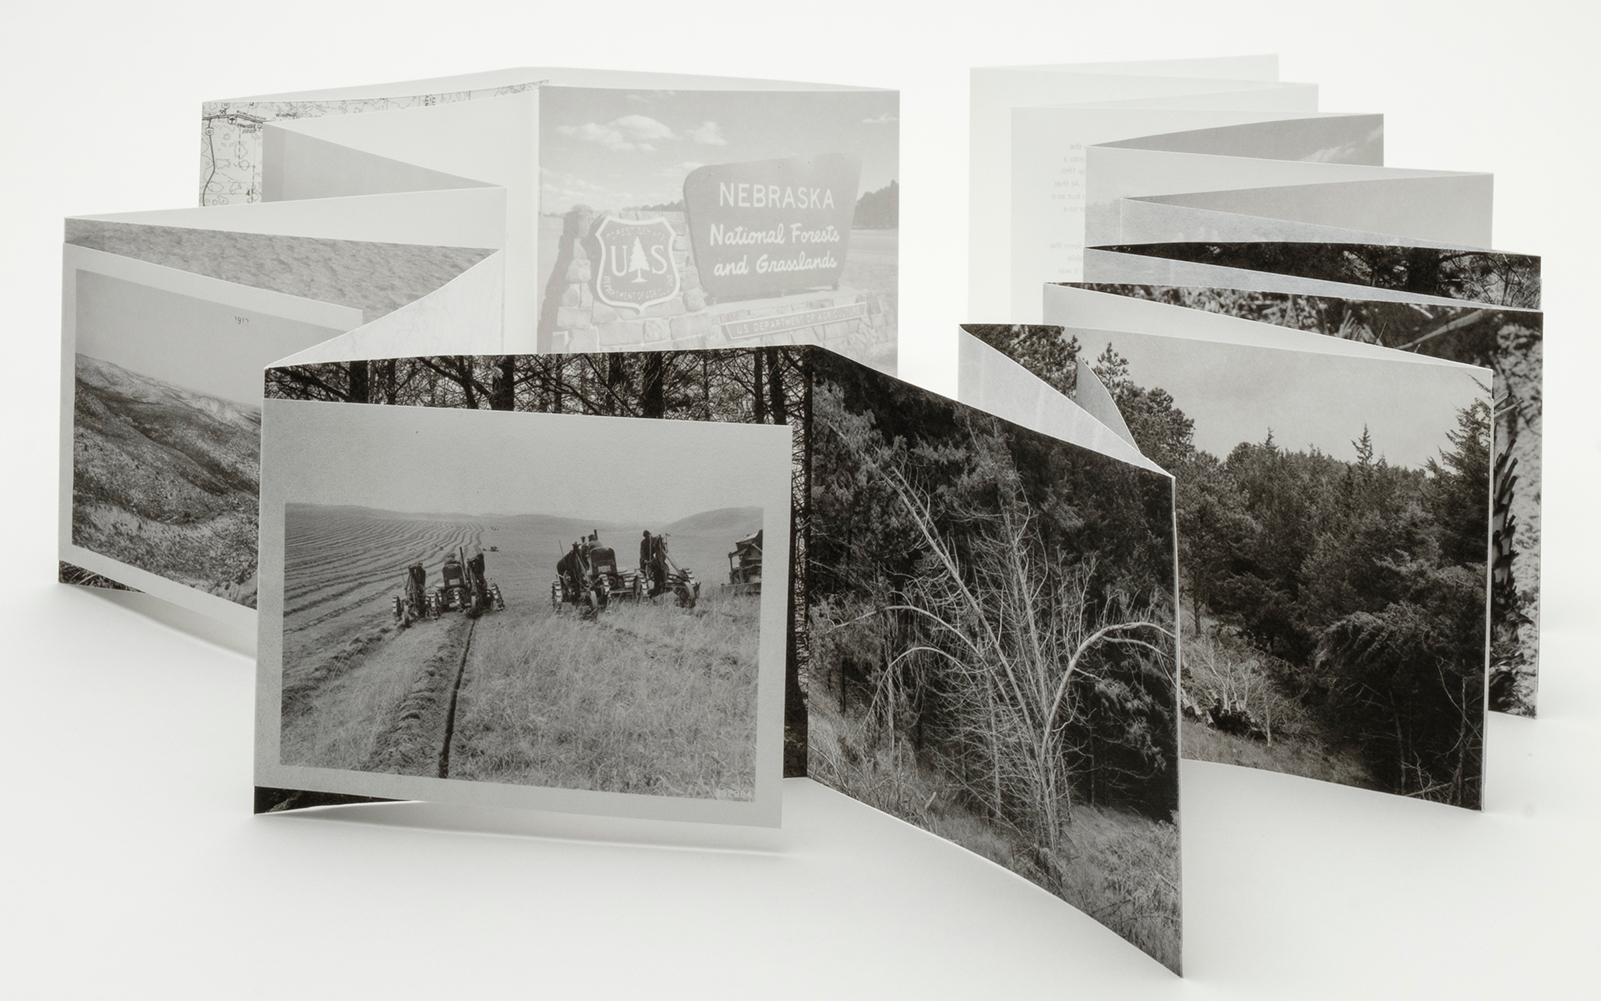 Pocket Field Guide to a Hybrid Landscape by Dana Fritz